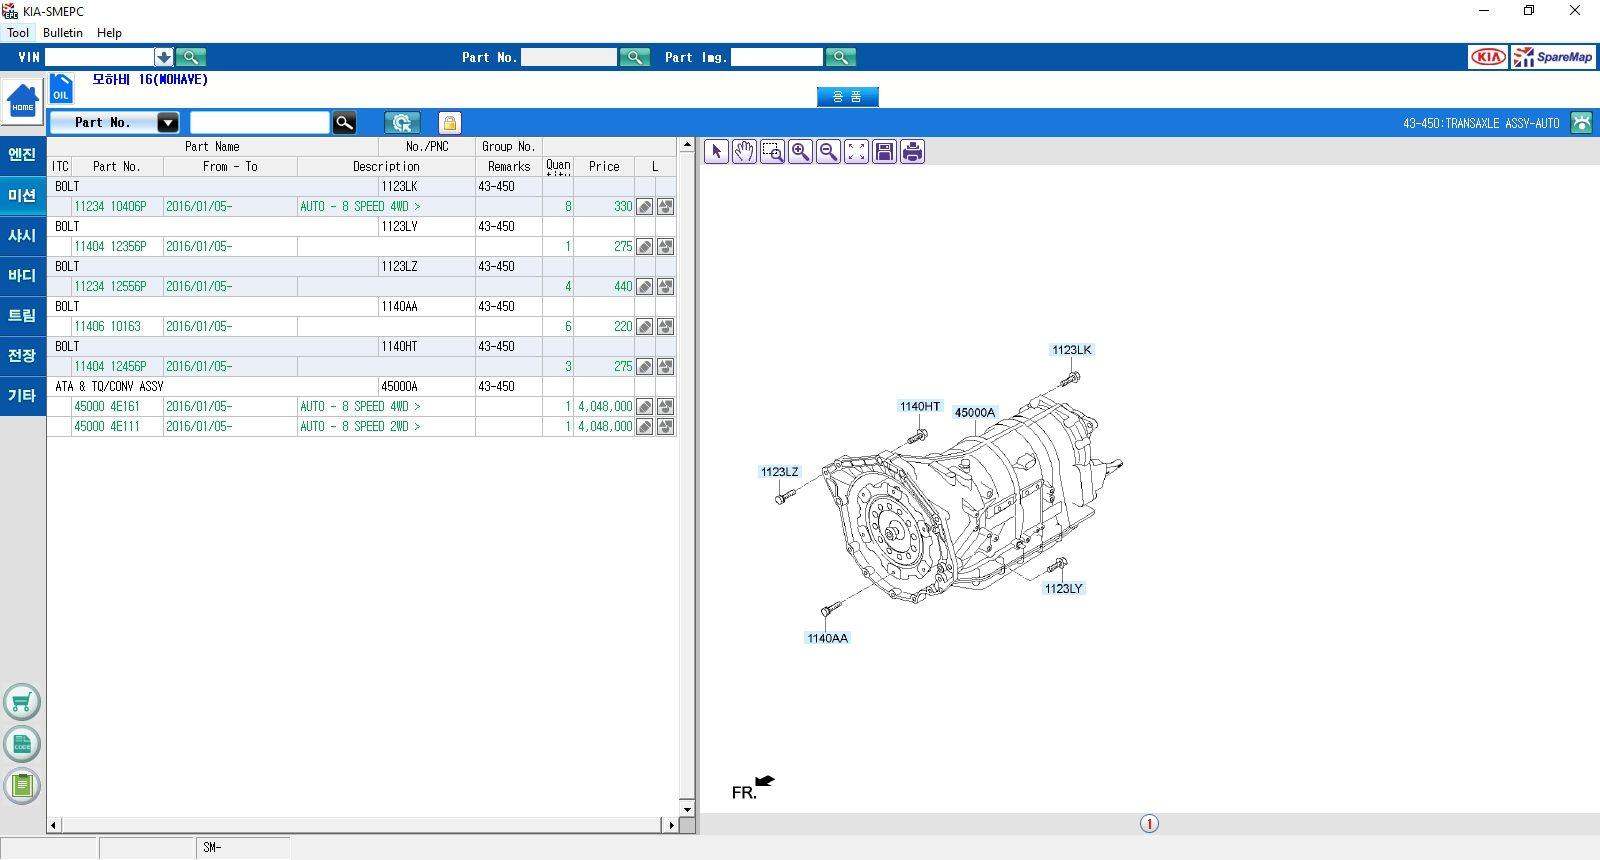 Hyundai_Kia_Korea_SM_EPC_072019_Parts_Catalog_Domestic_Market_4